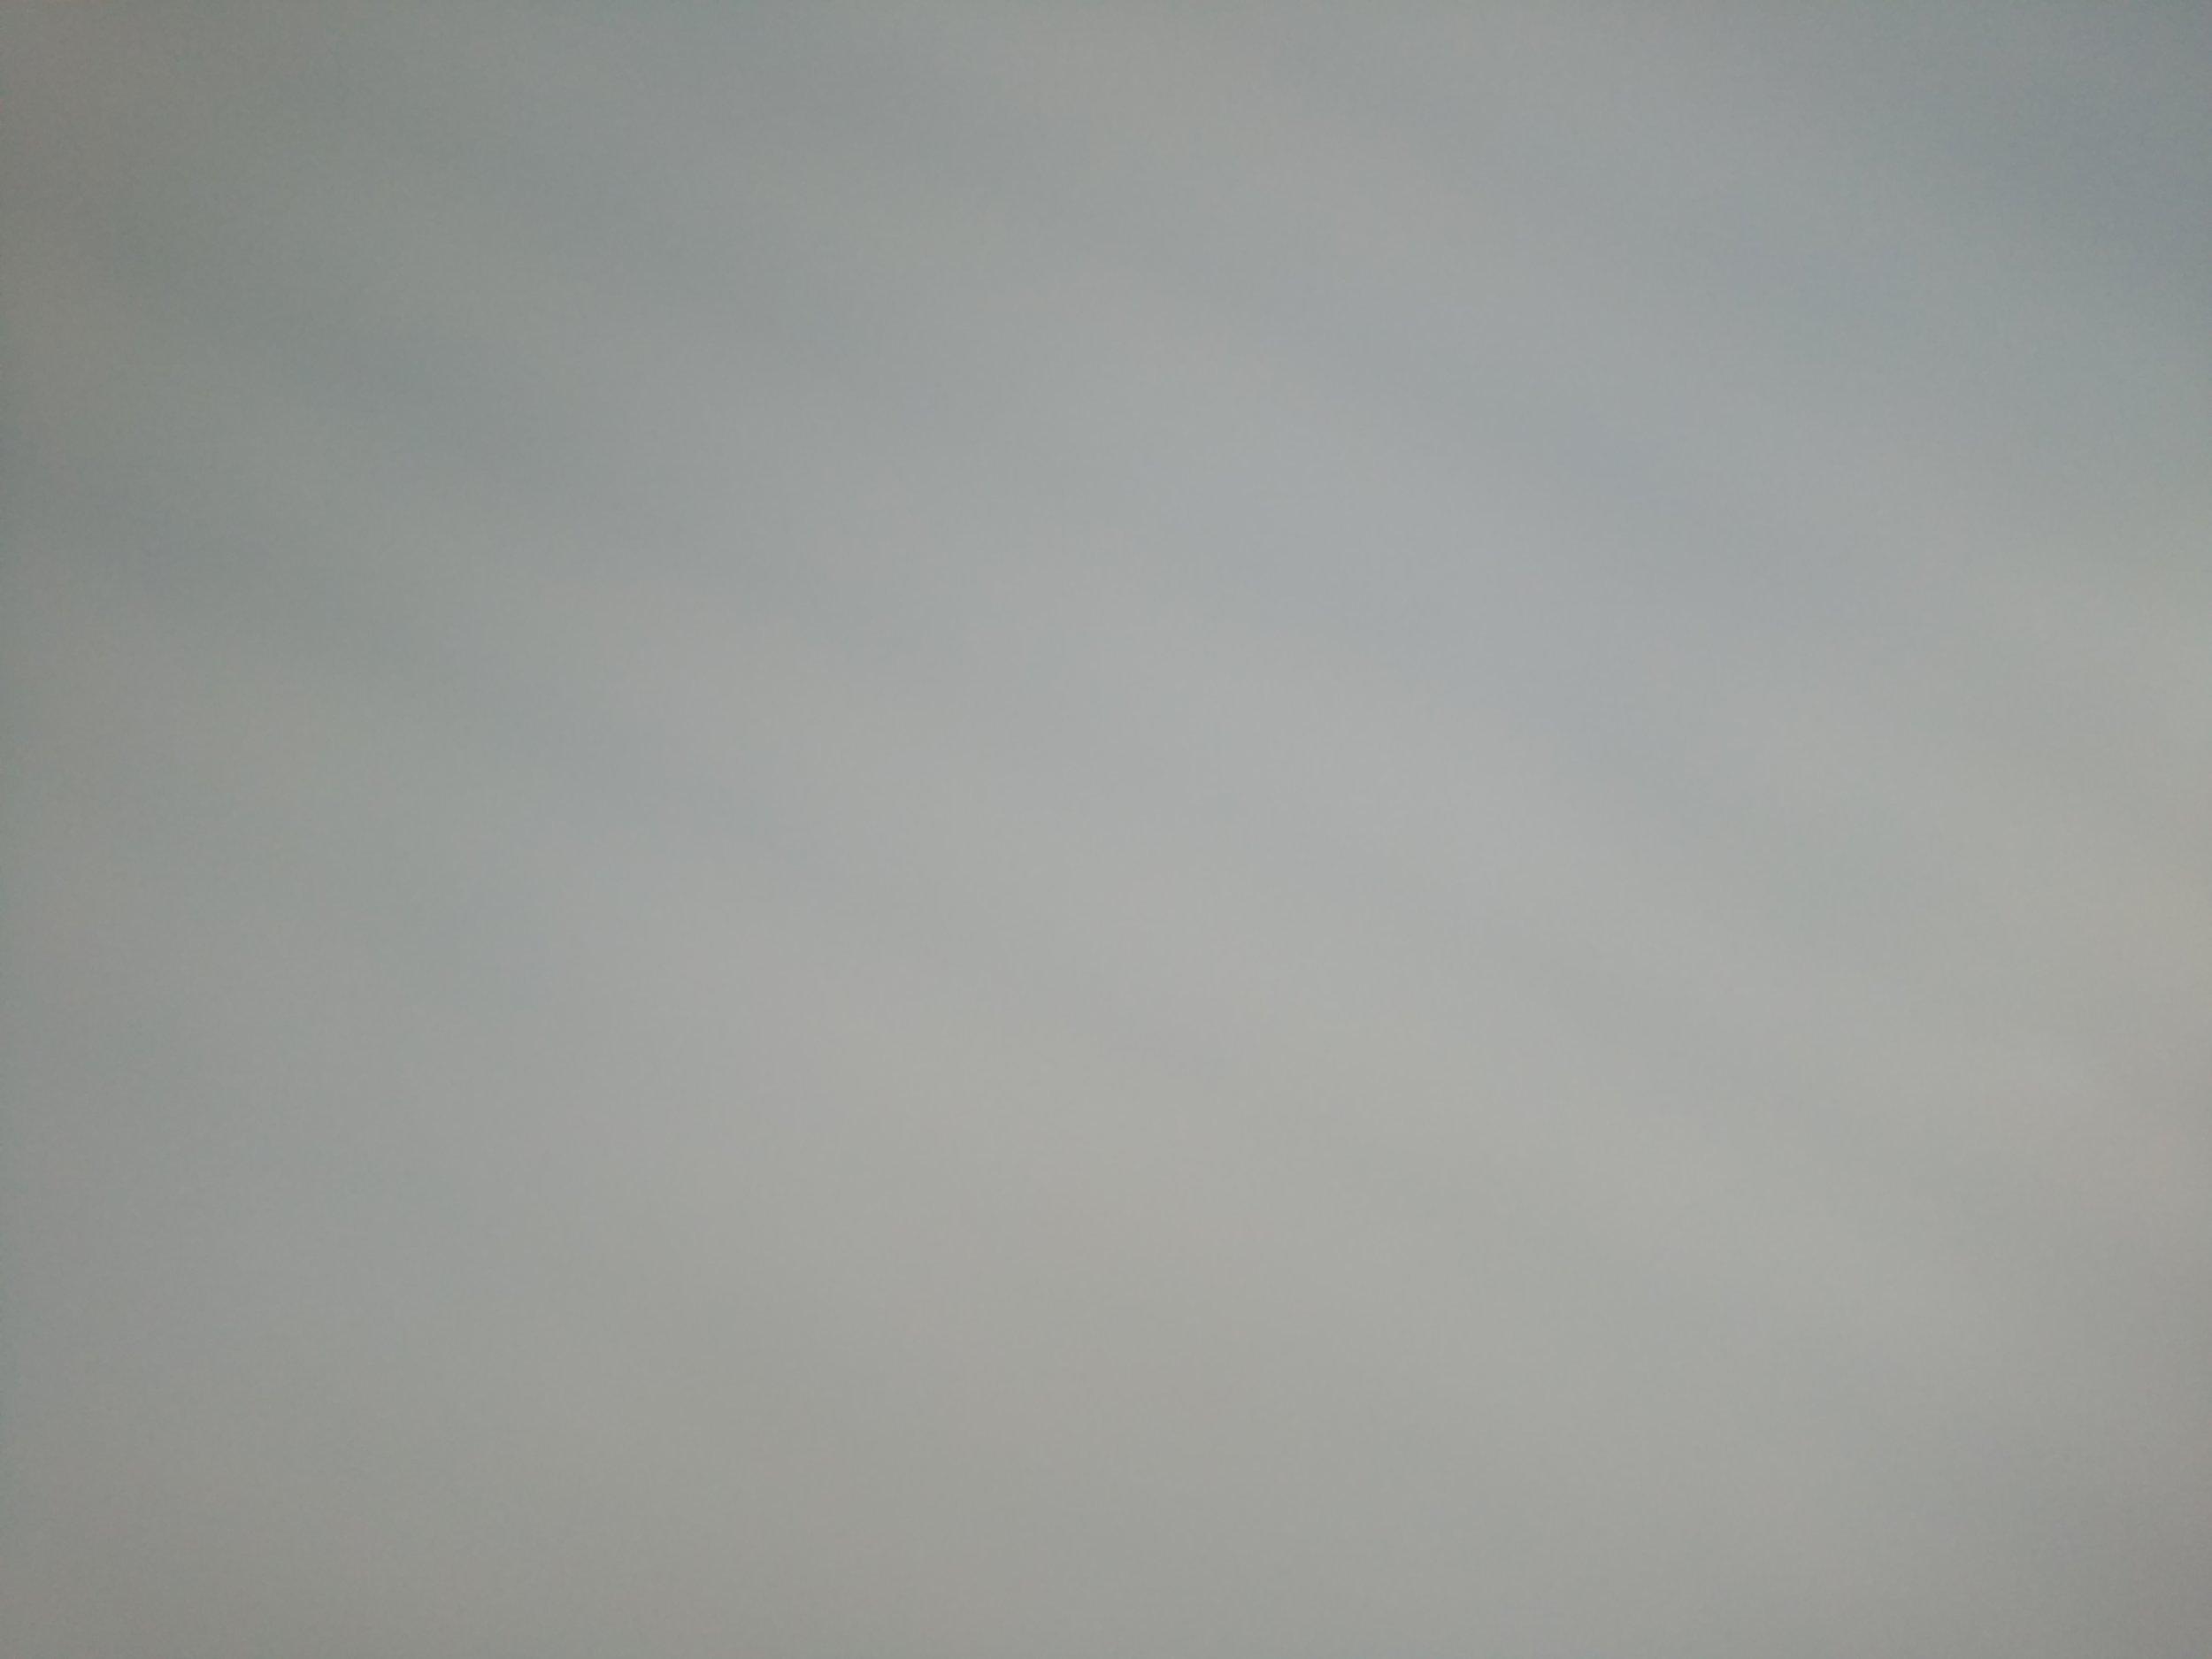 willroth-co-free-texture-gradient-067.jpg